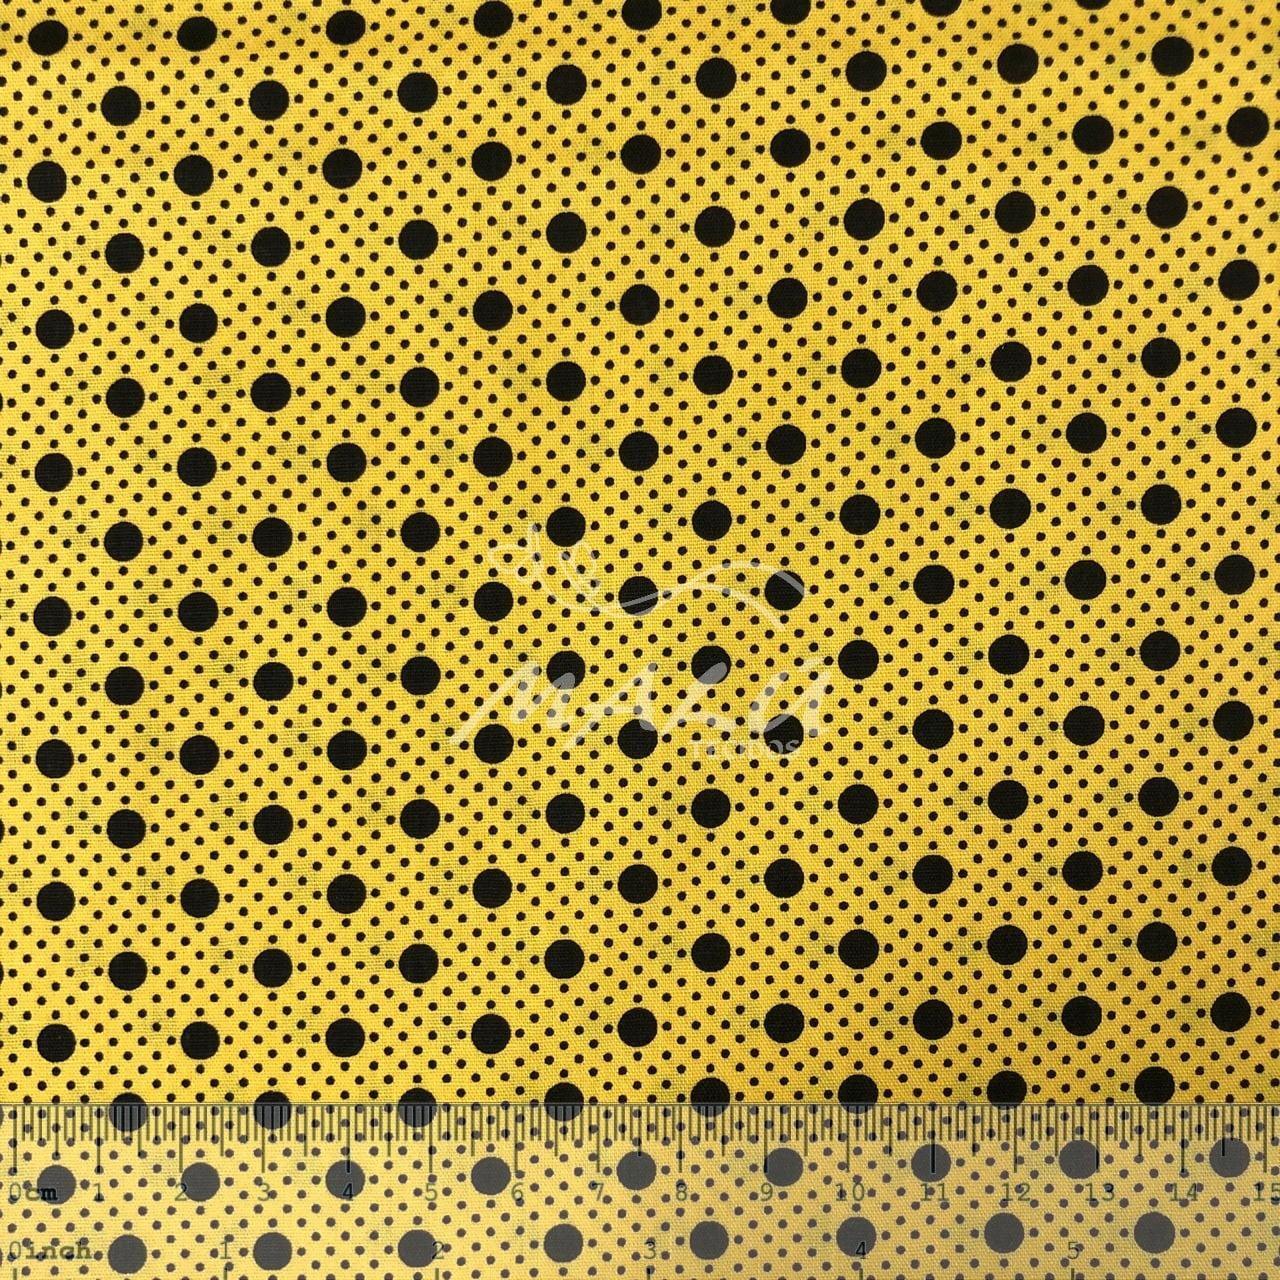 Tricoline Poa Amarelo com Preto